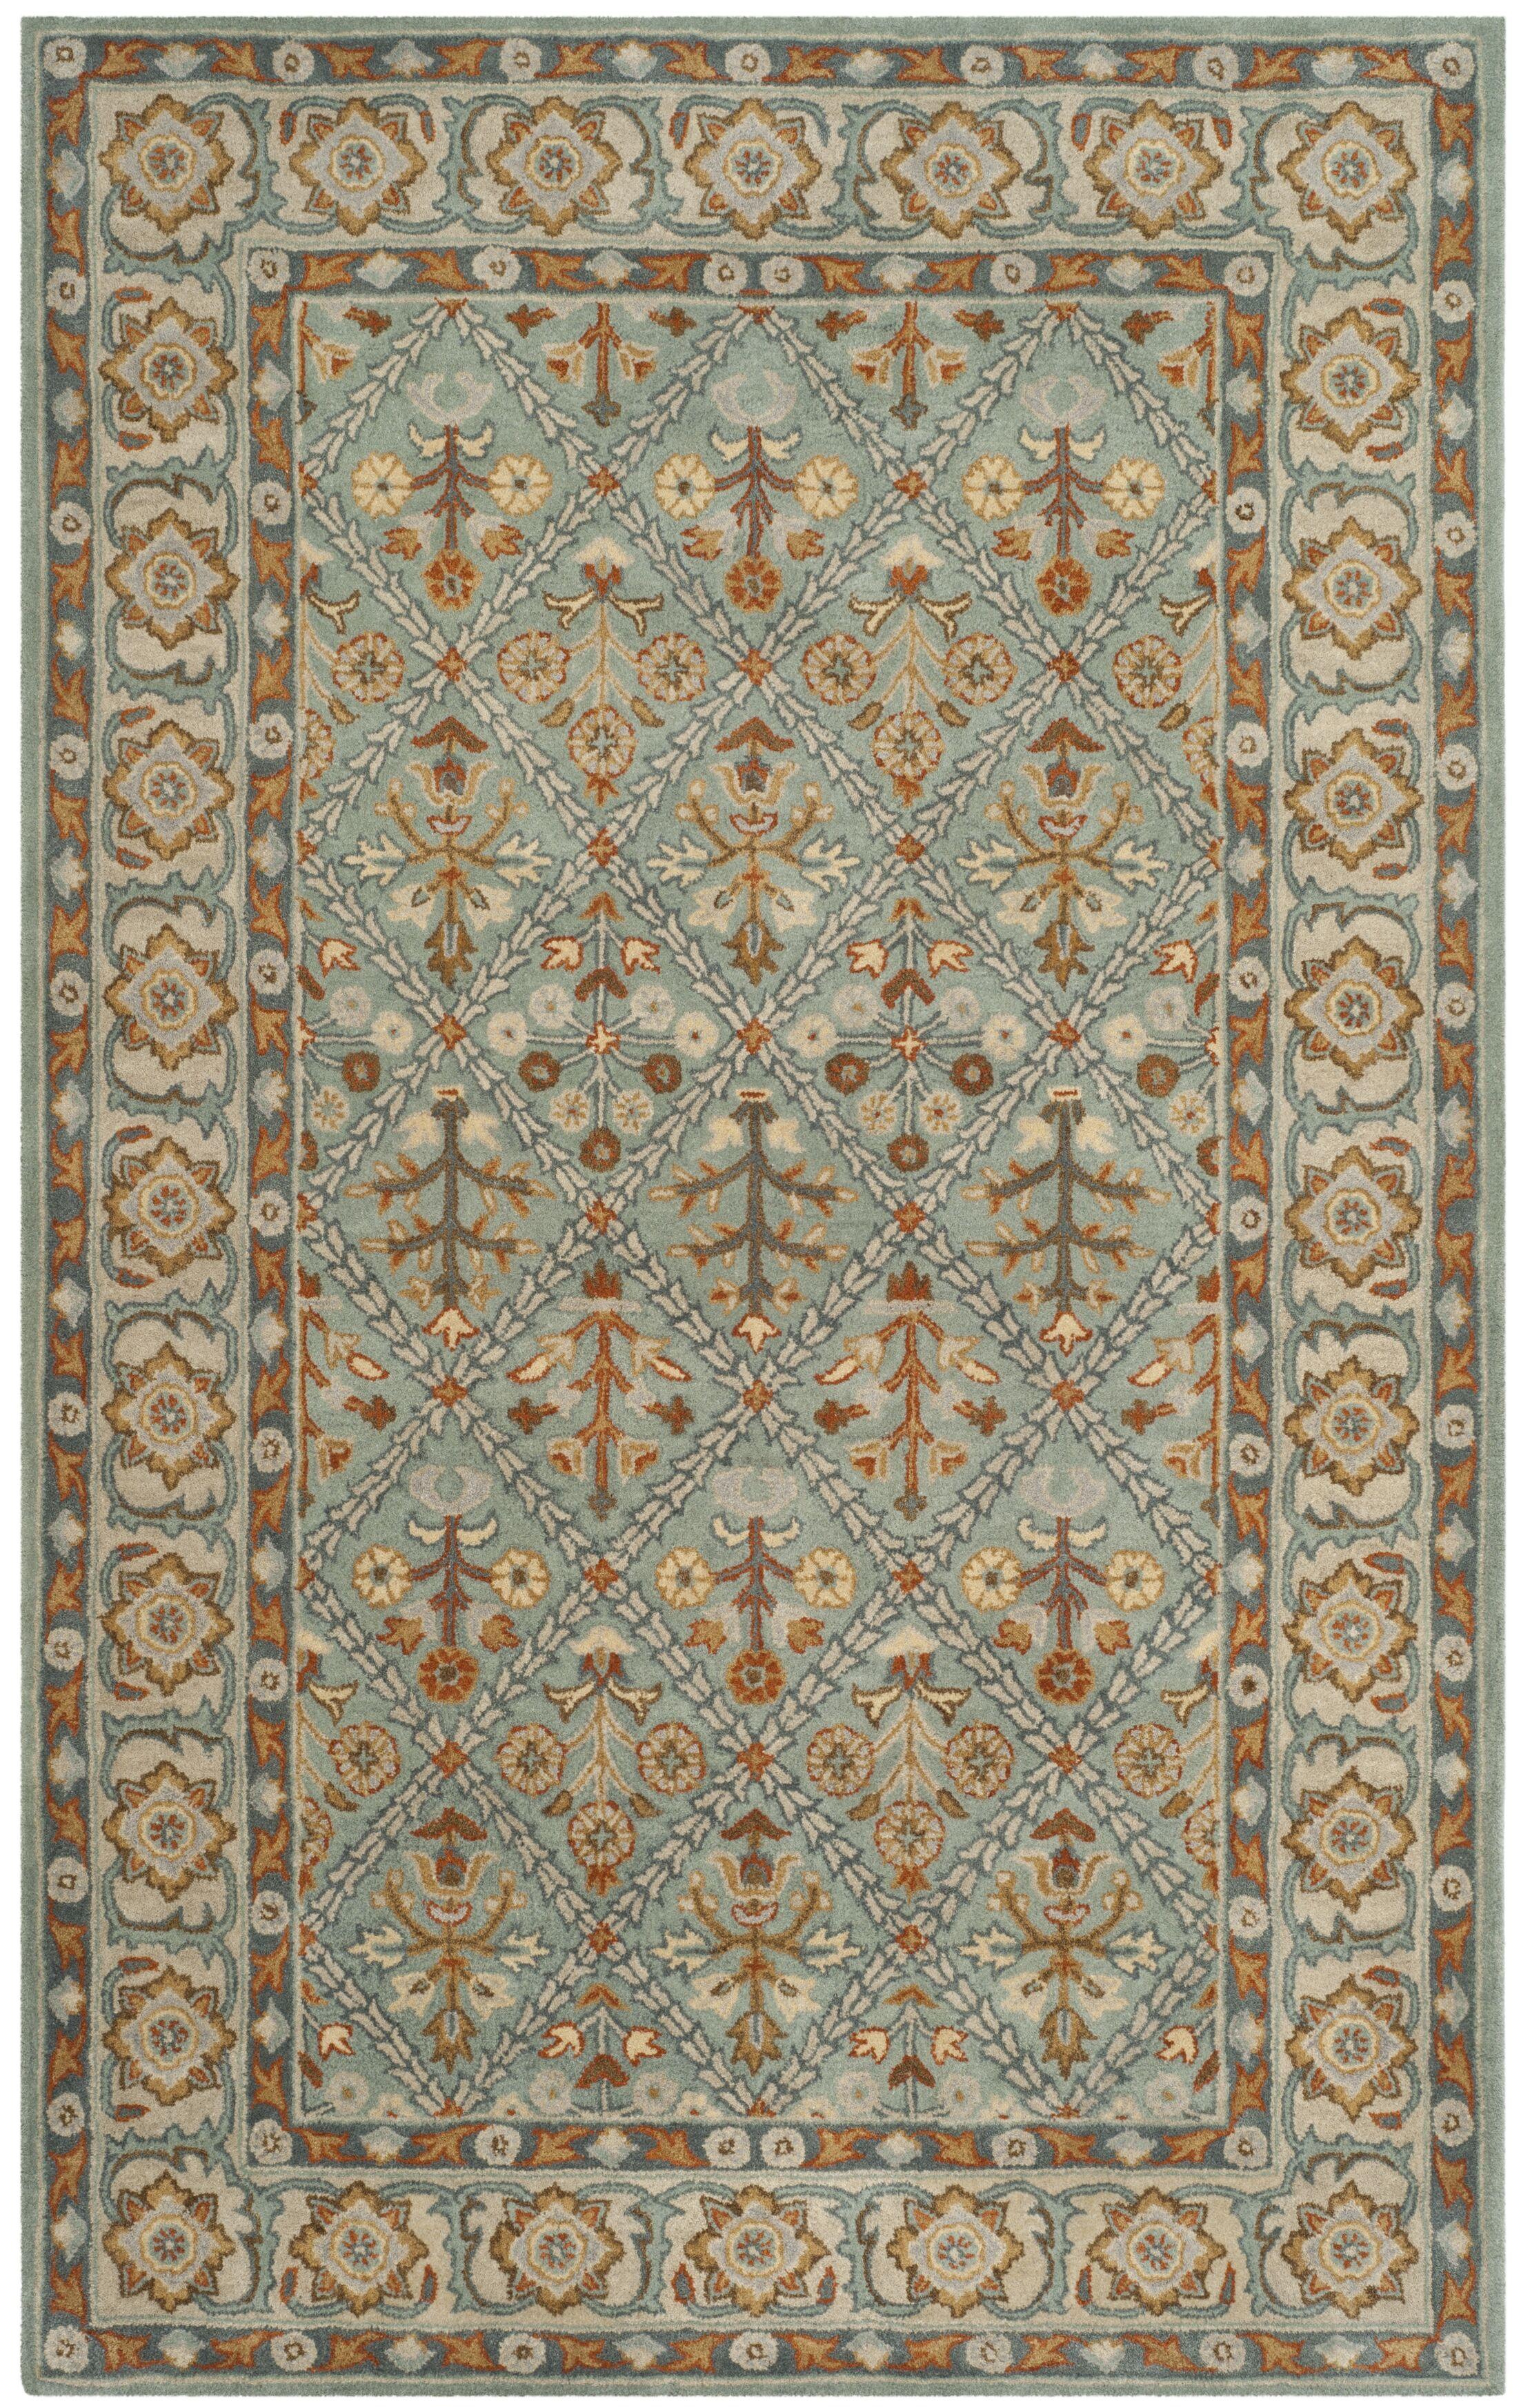 Moss Hand Tufted Wool Blue/Orange Area Rug Rug Size: Rectangle 5' x 8'